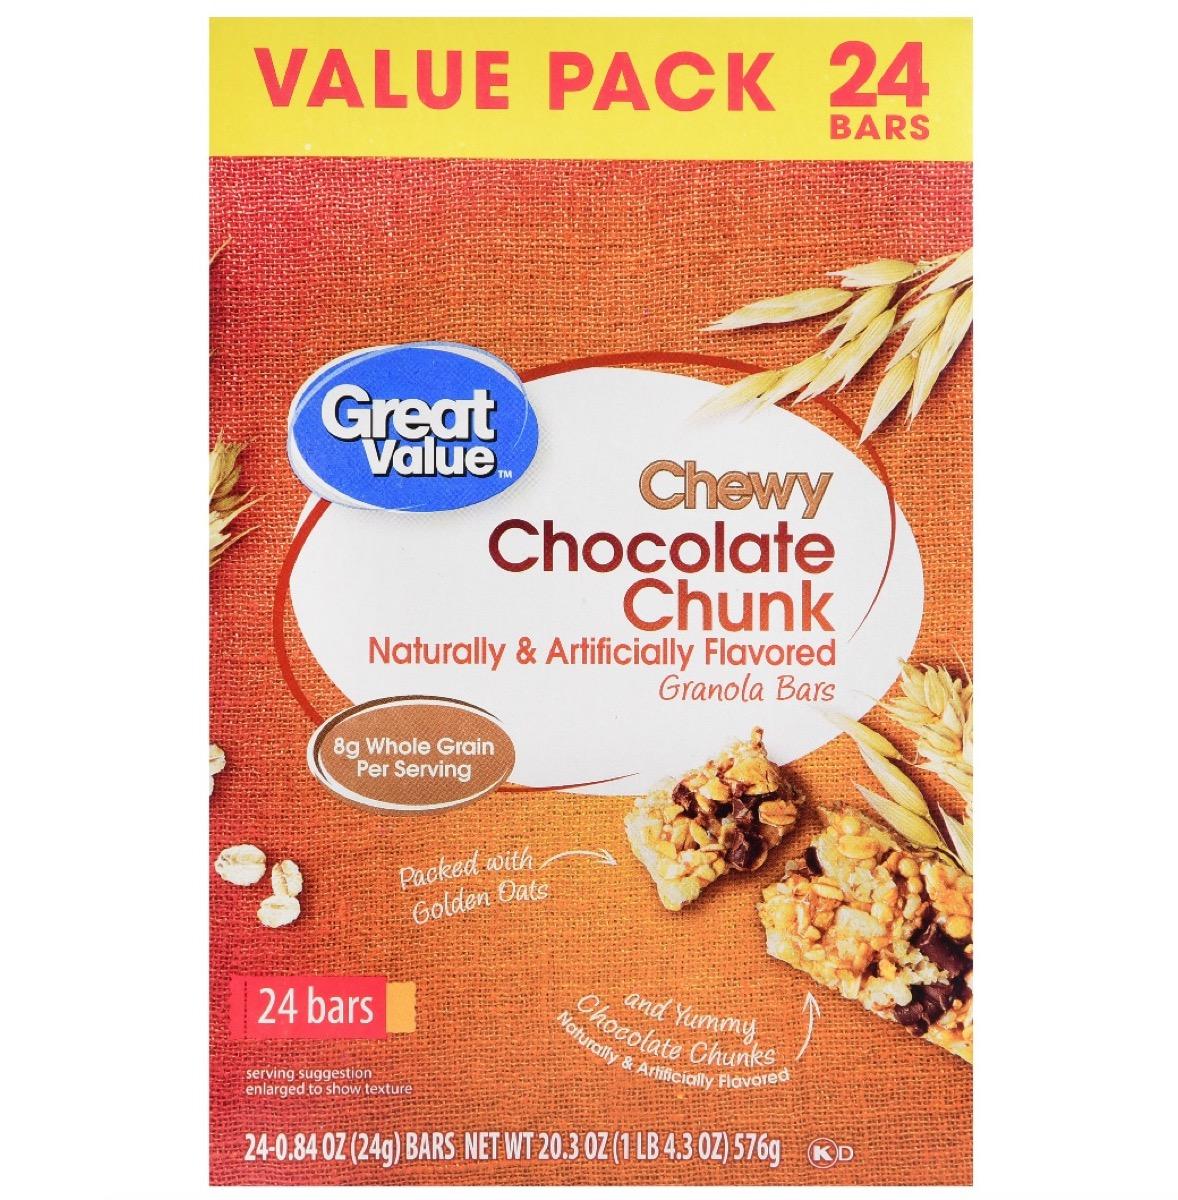 Walmart Great Value Granola Bars